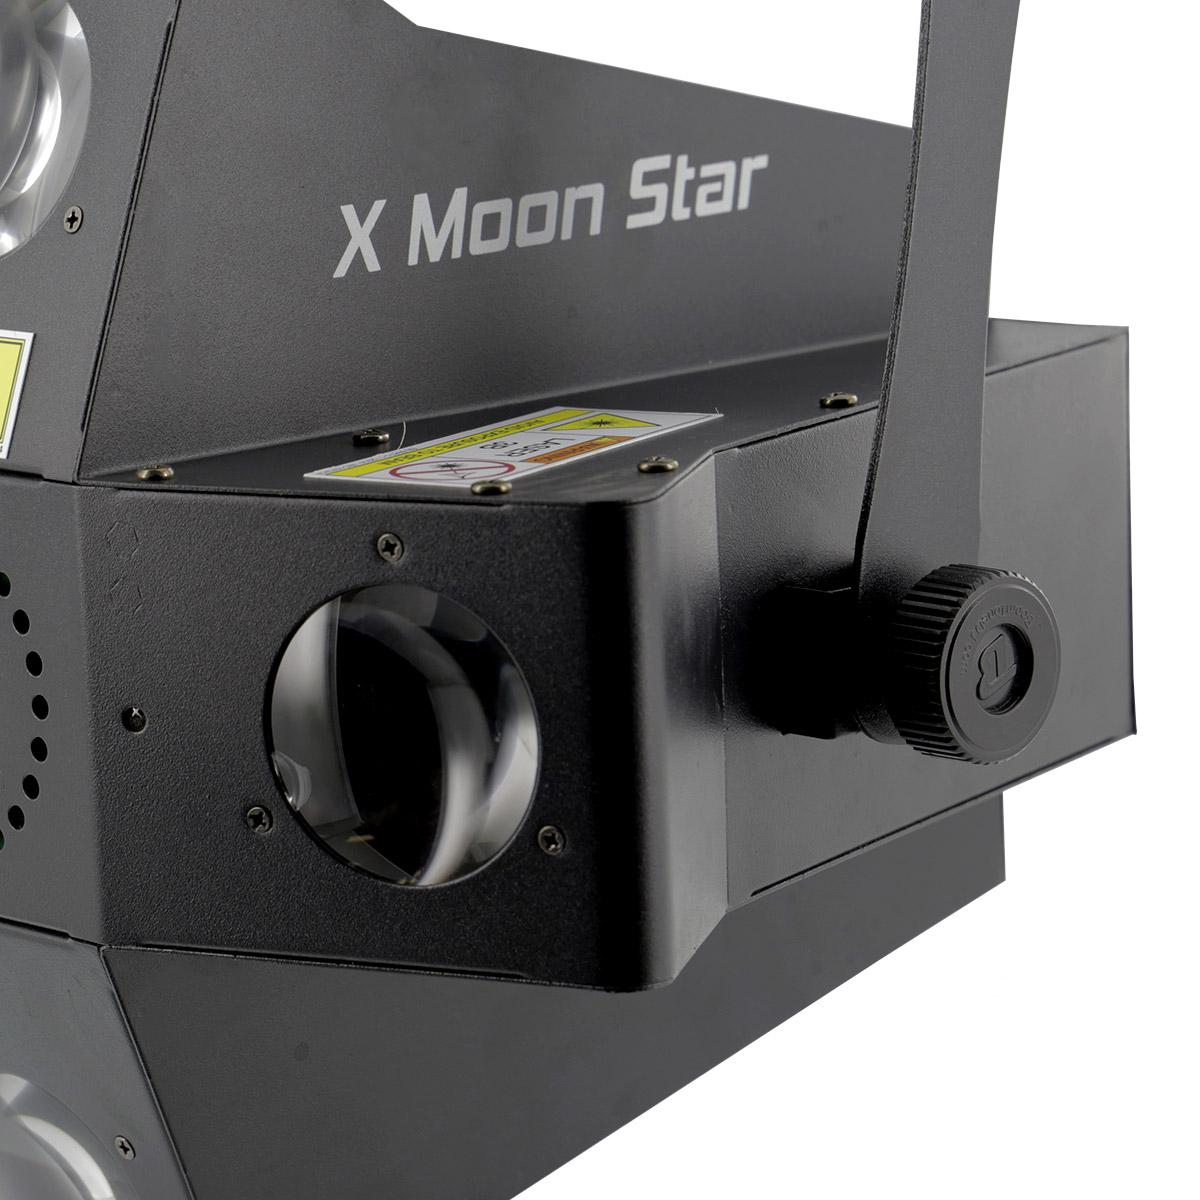 X Moon Star